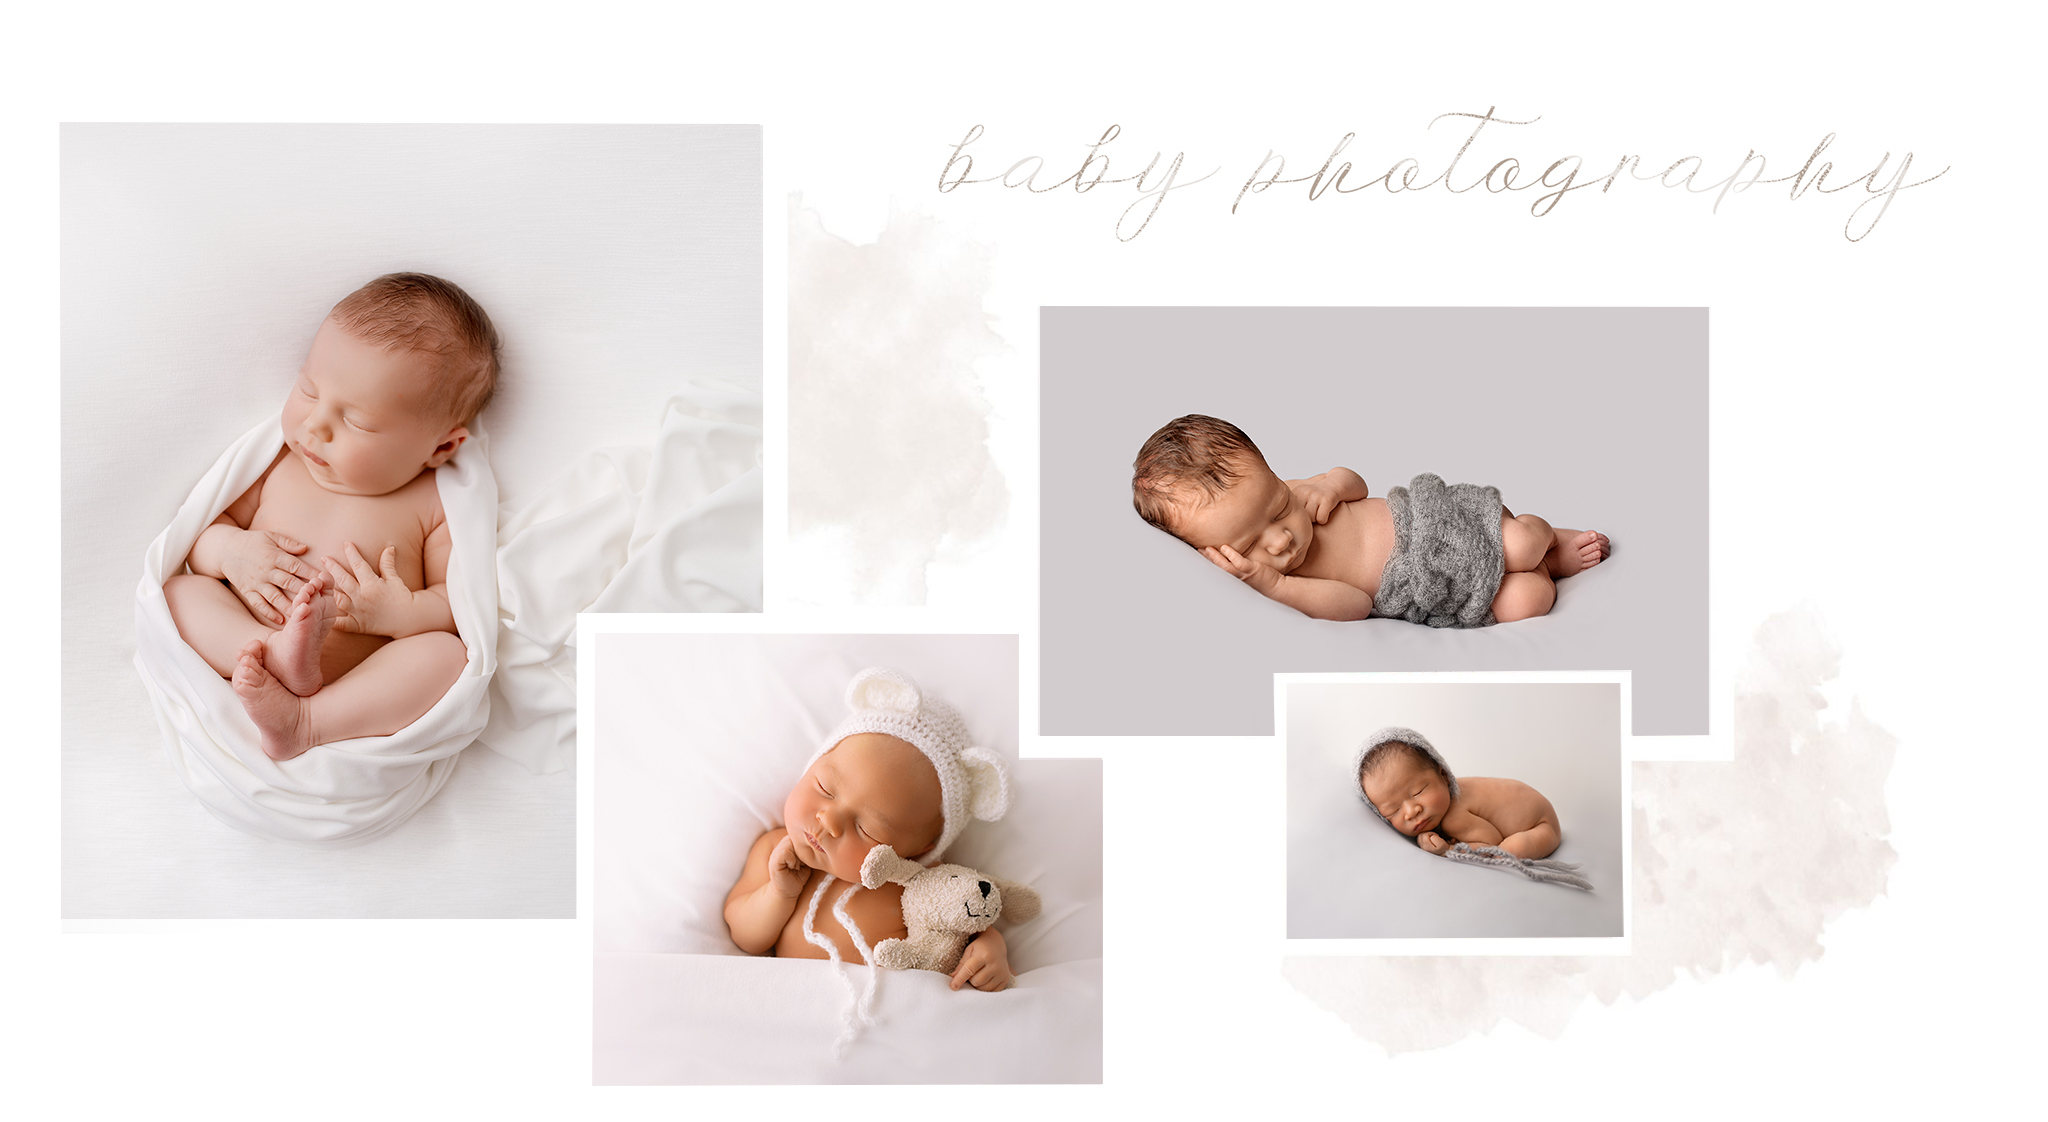 beautifullittlemoments-baby-photography-homepage-image5